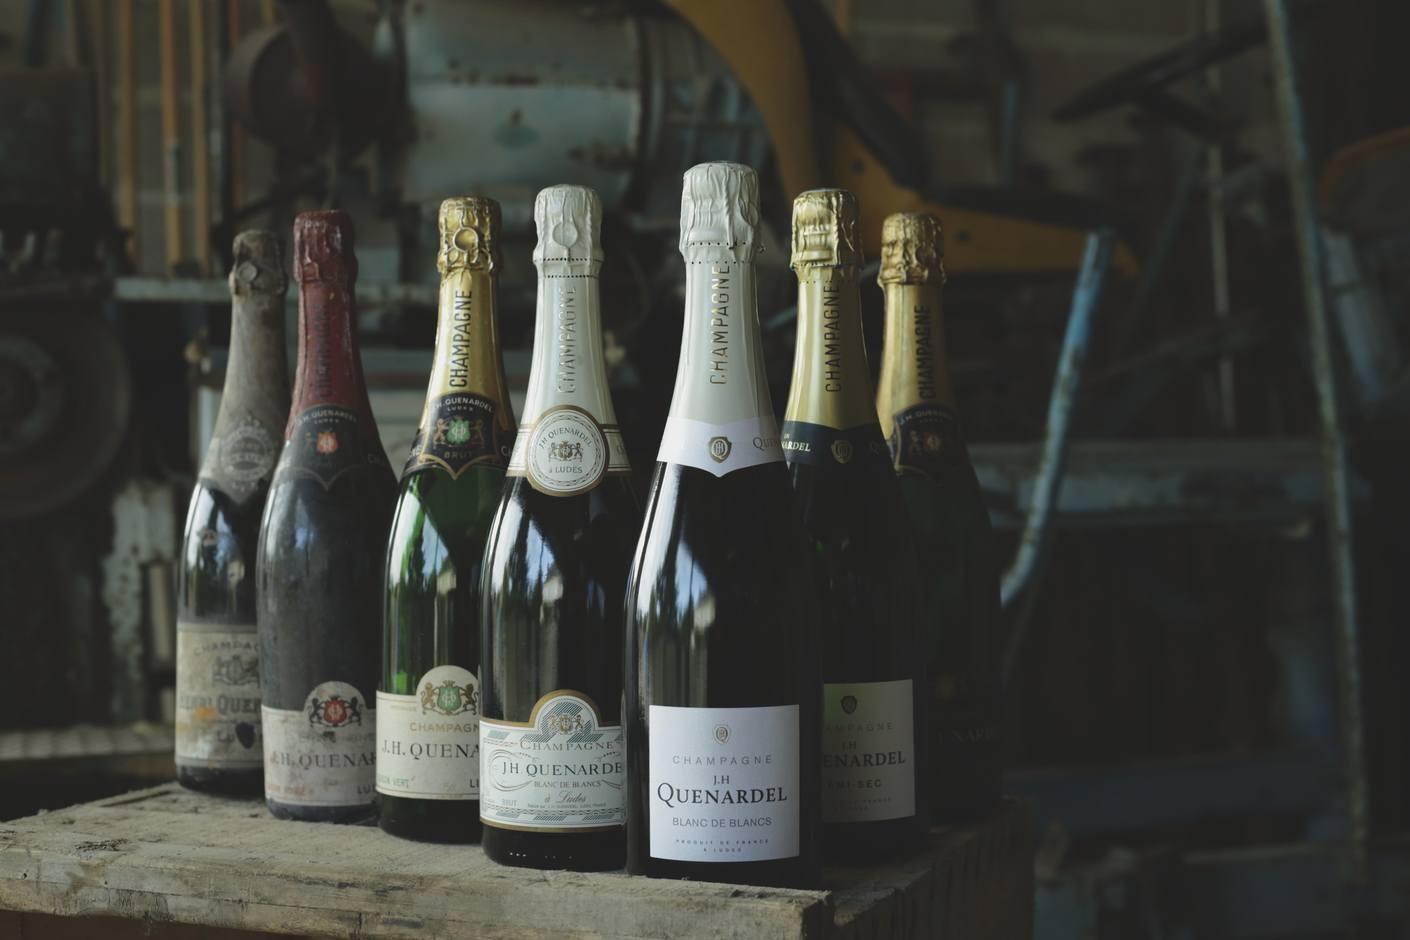 Champagne J.H. Quenardel